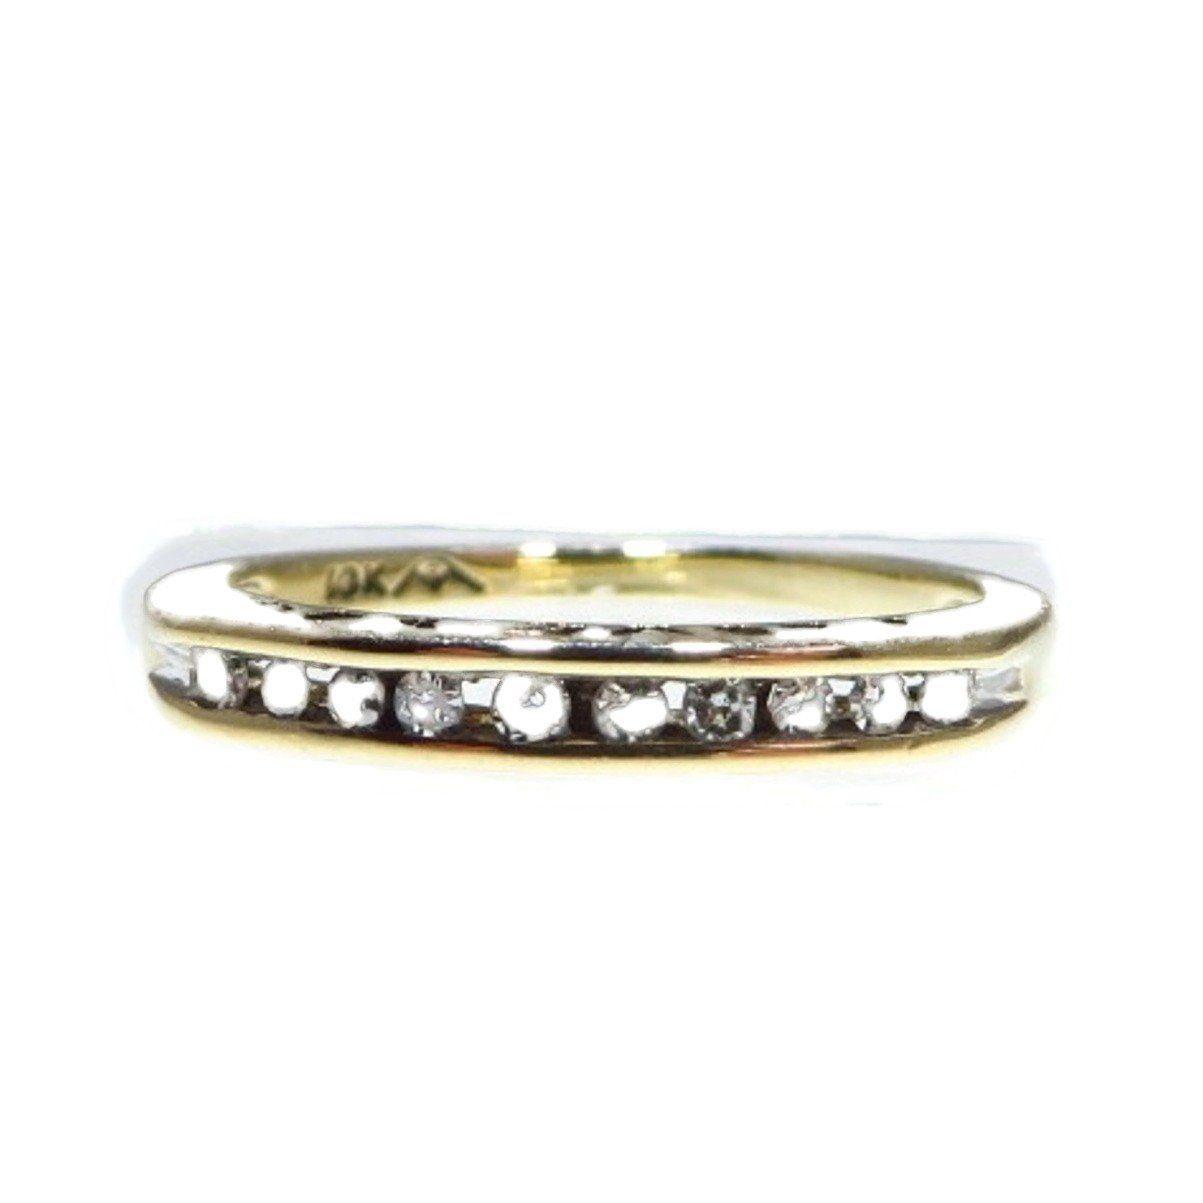 Diamond wedding ring vintage 10k yellow gold 10ct